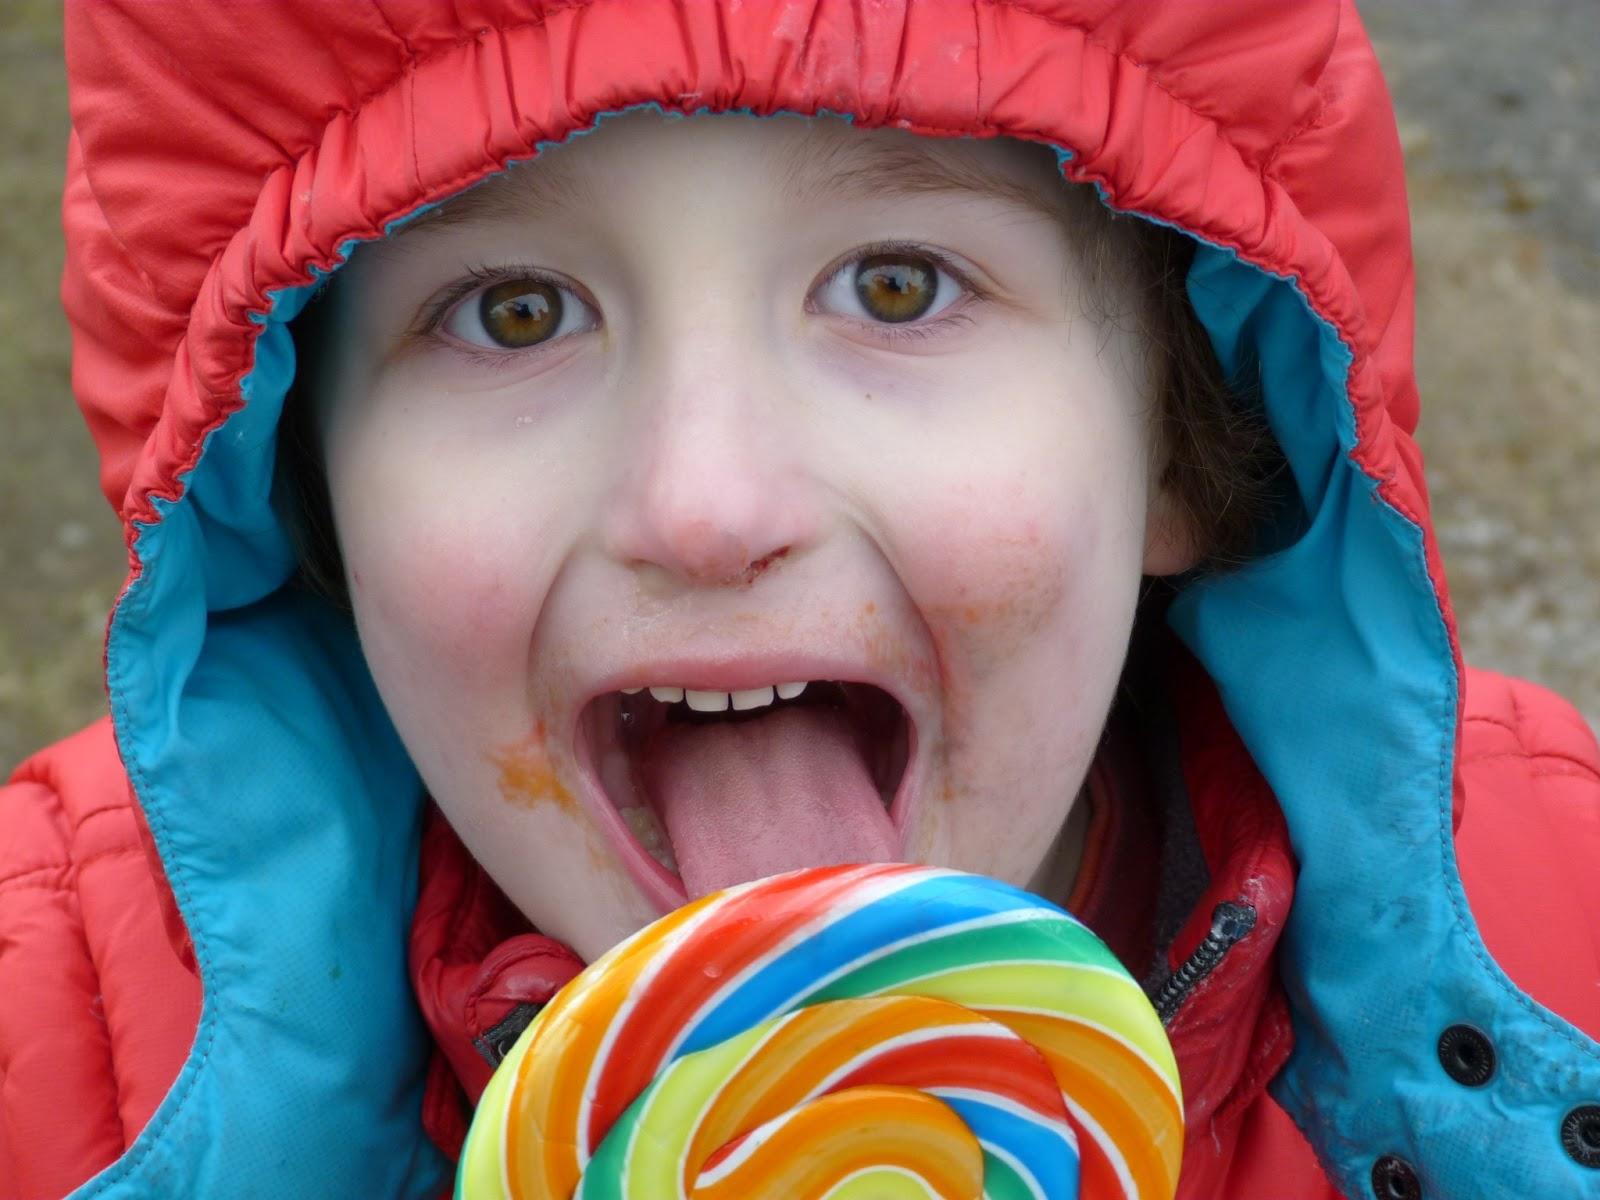 boy licking lollypop